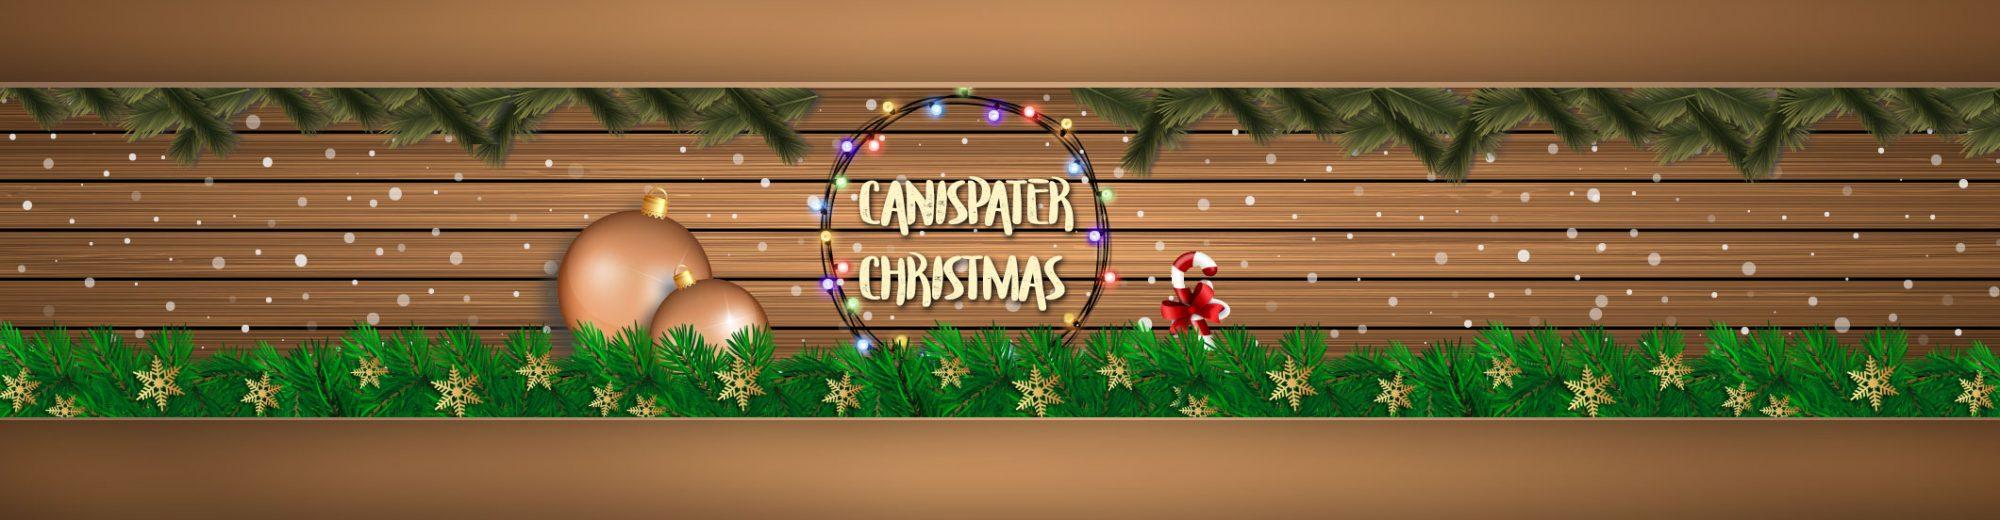 Canispater